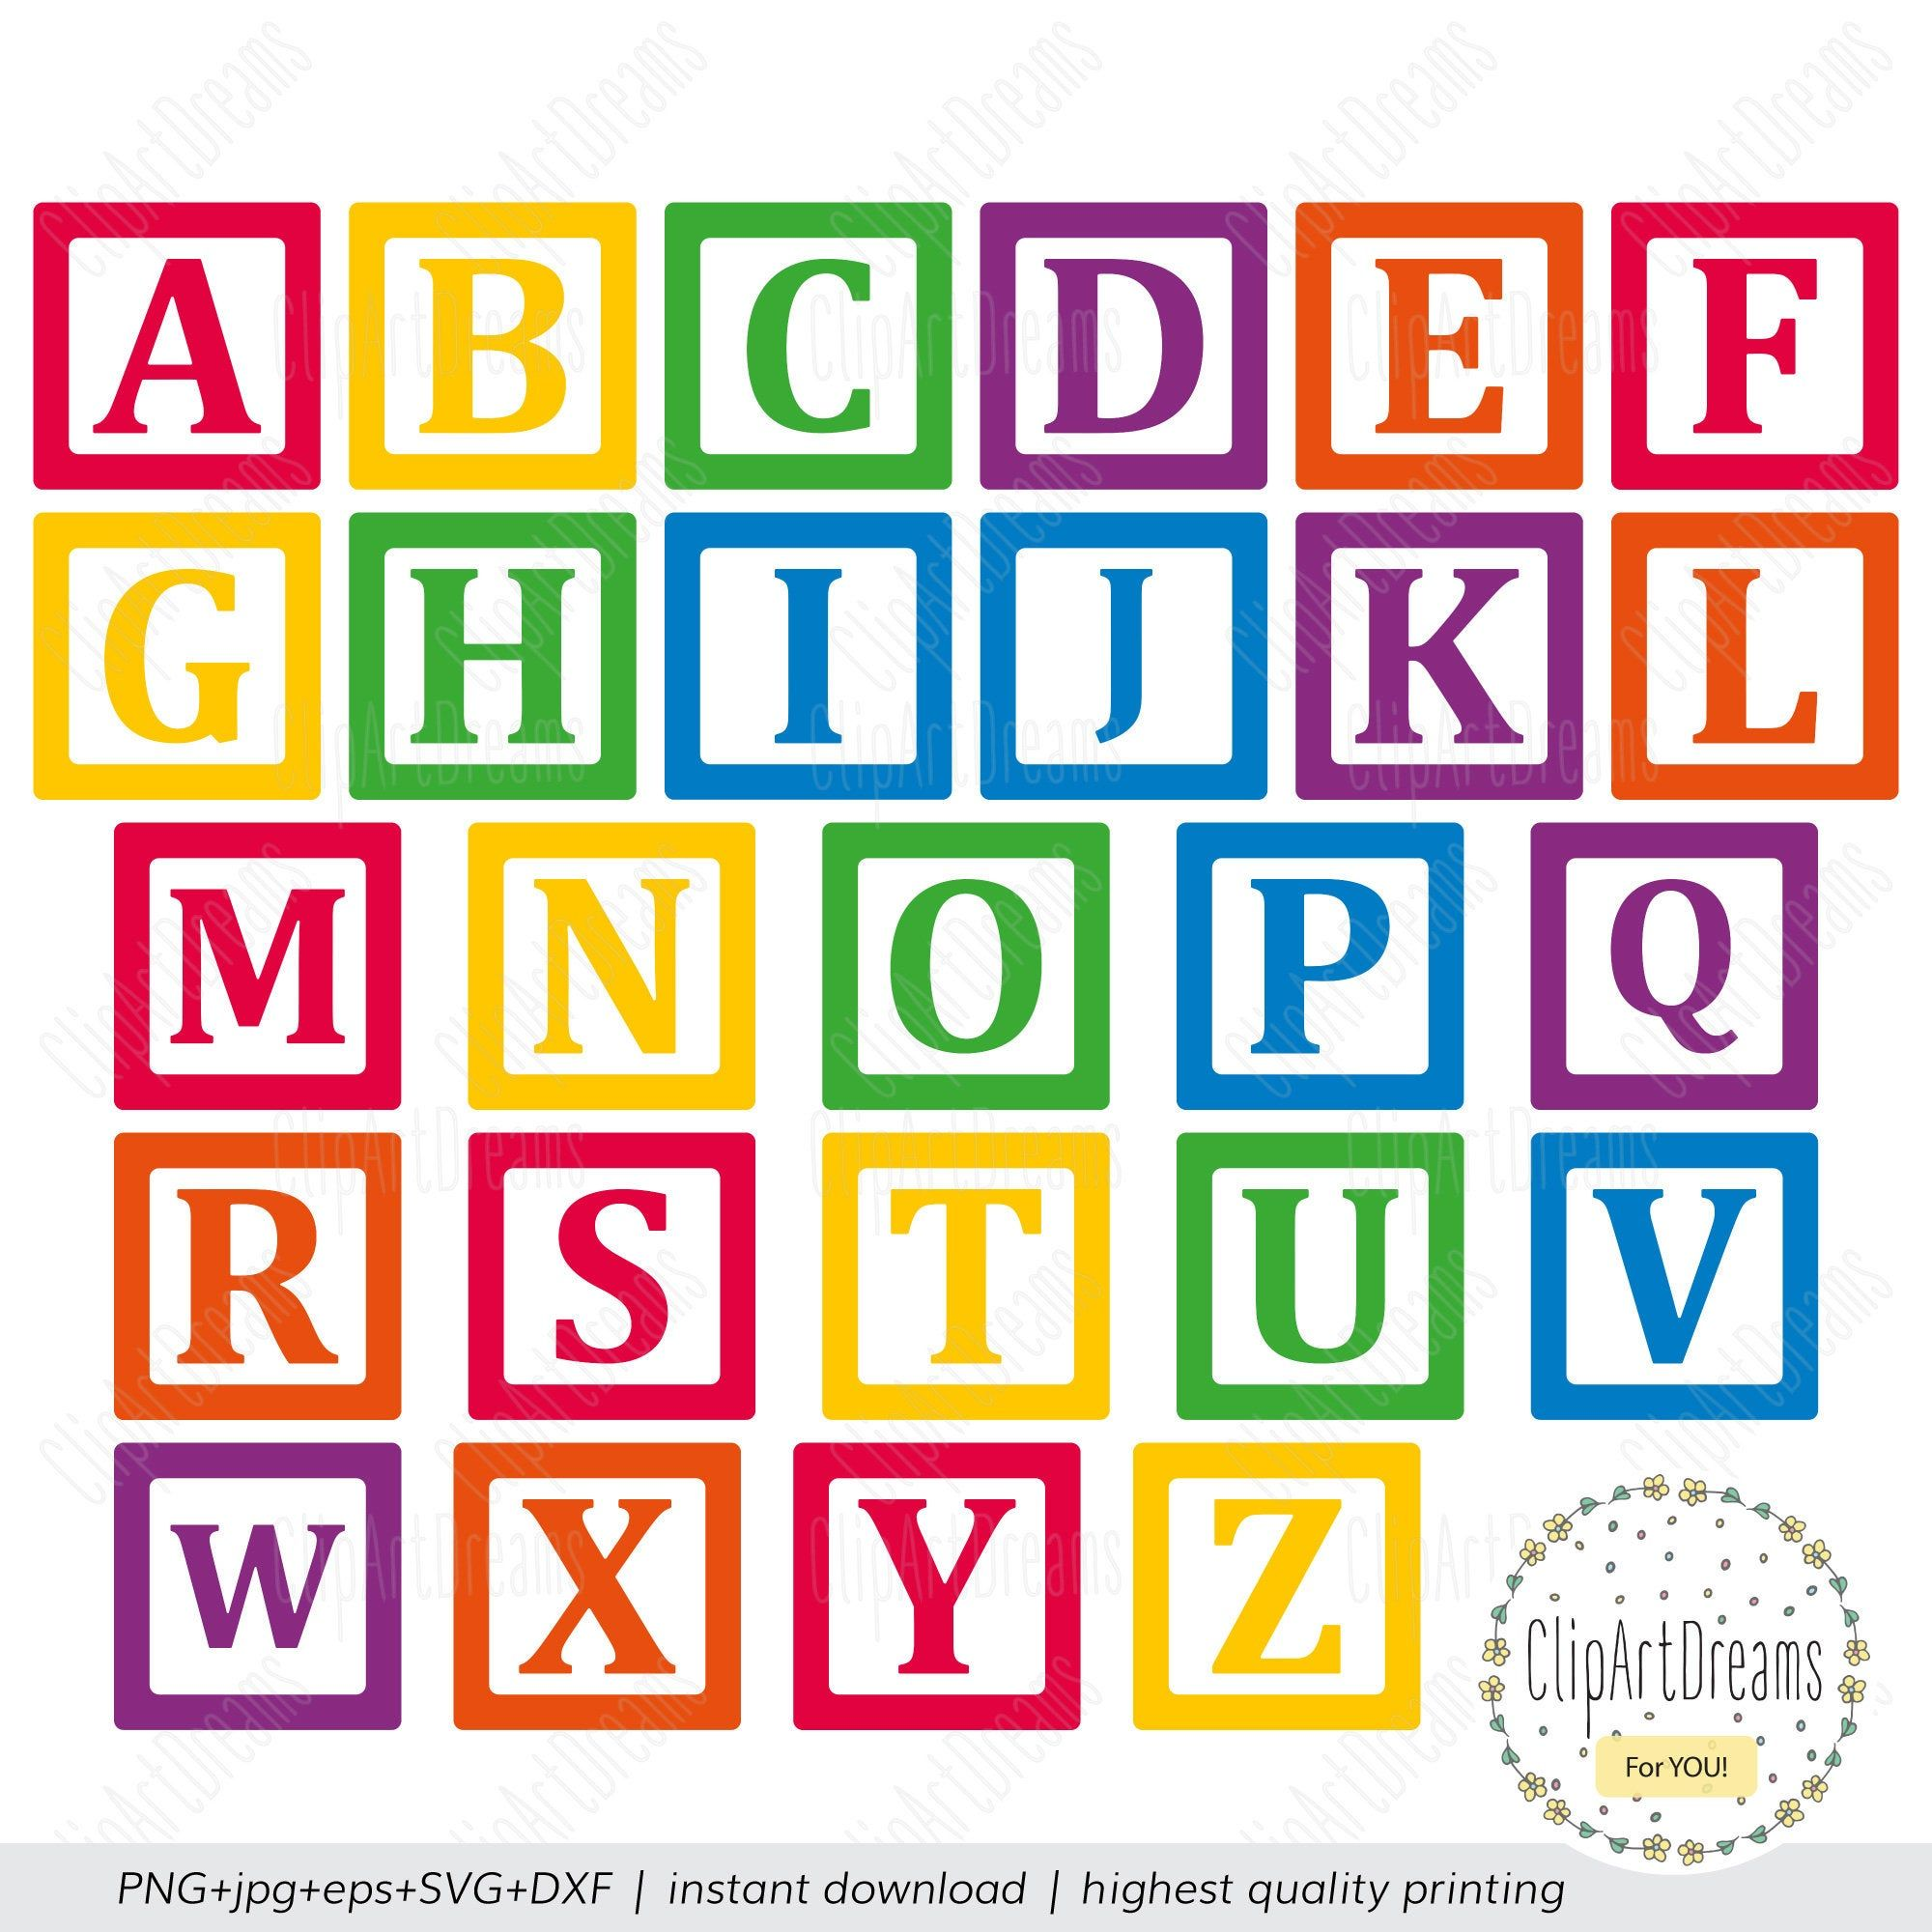 Building Block Font Svg Toy Blocks Letters Alphabet Abc Baby Etsy Block Letter Alphabet Lettering Alphabet Block Lettering